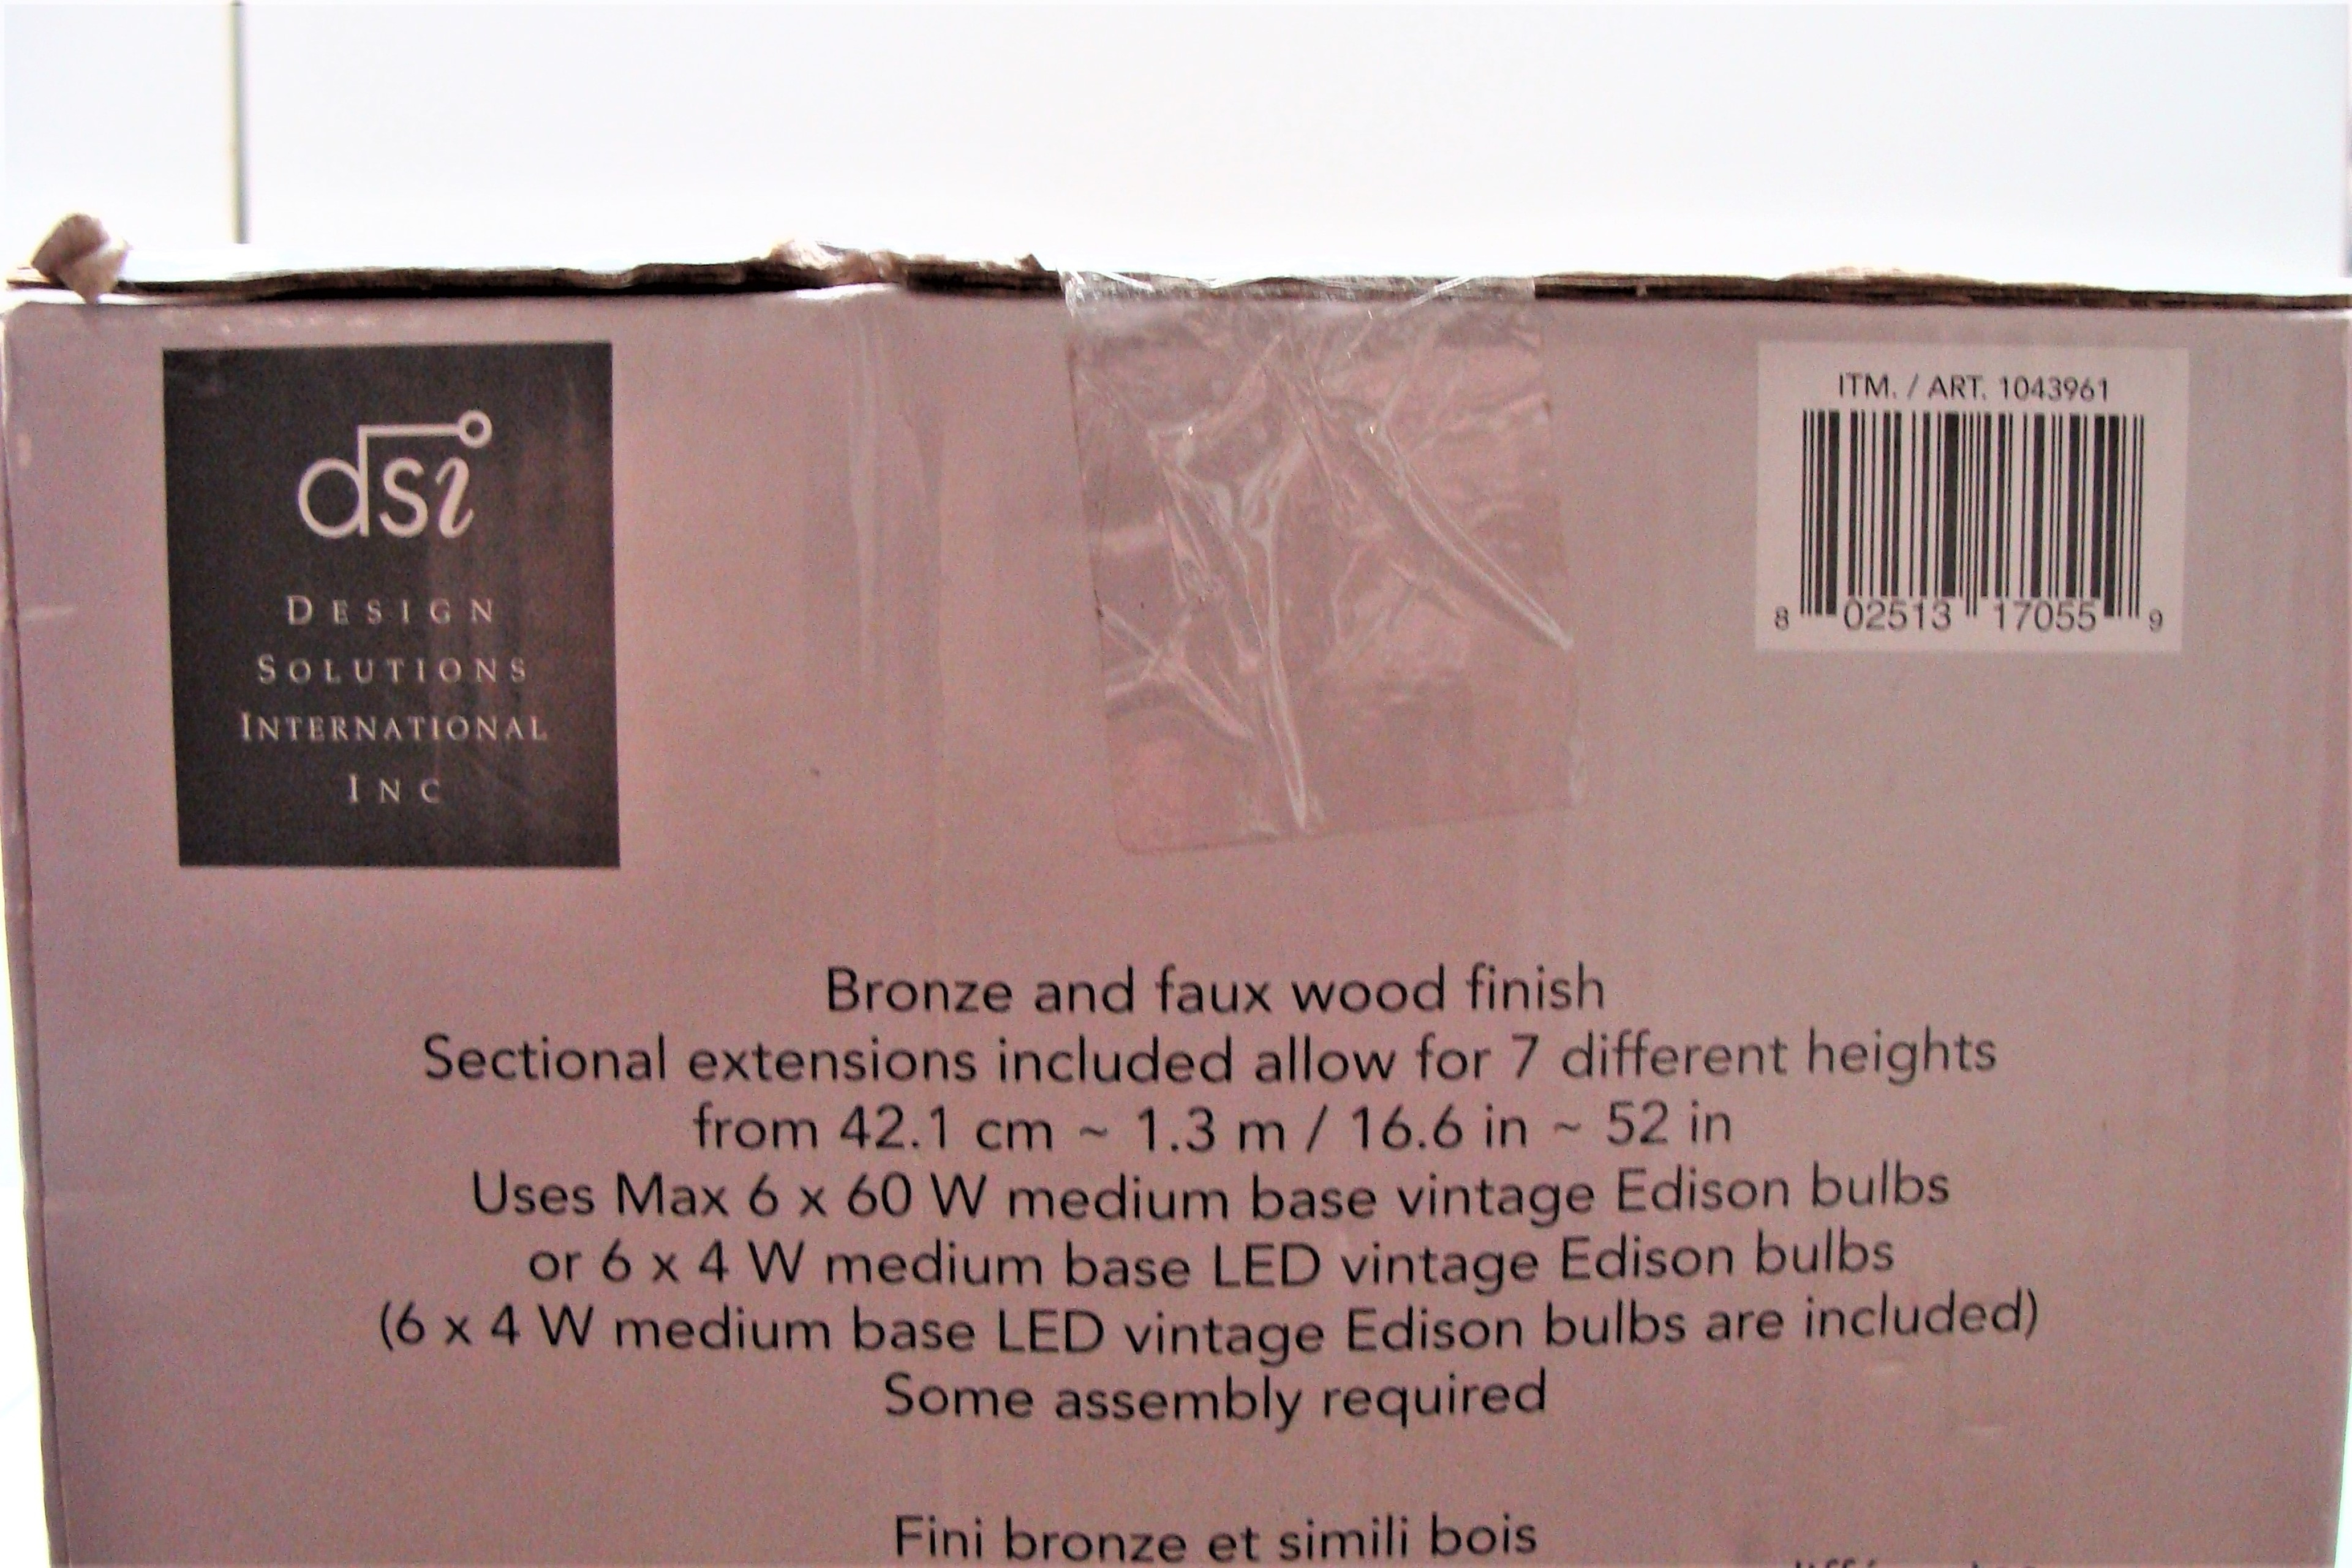 6 Light Led Chandelier Dsi Bronze Faux Wood Finish New Light Fixture